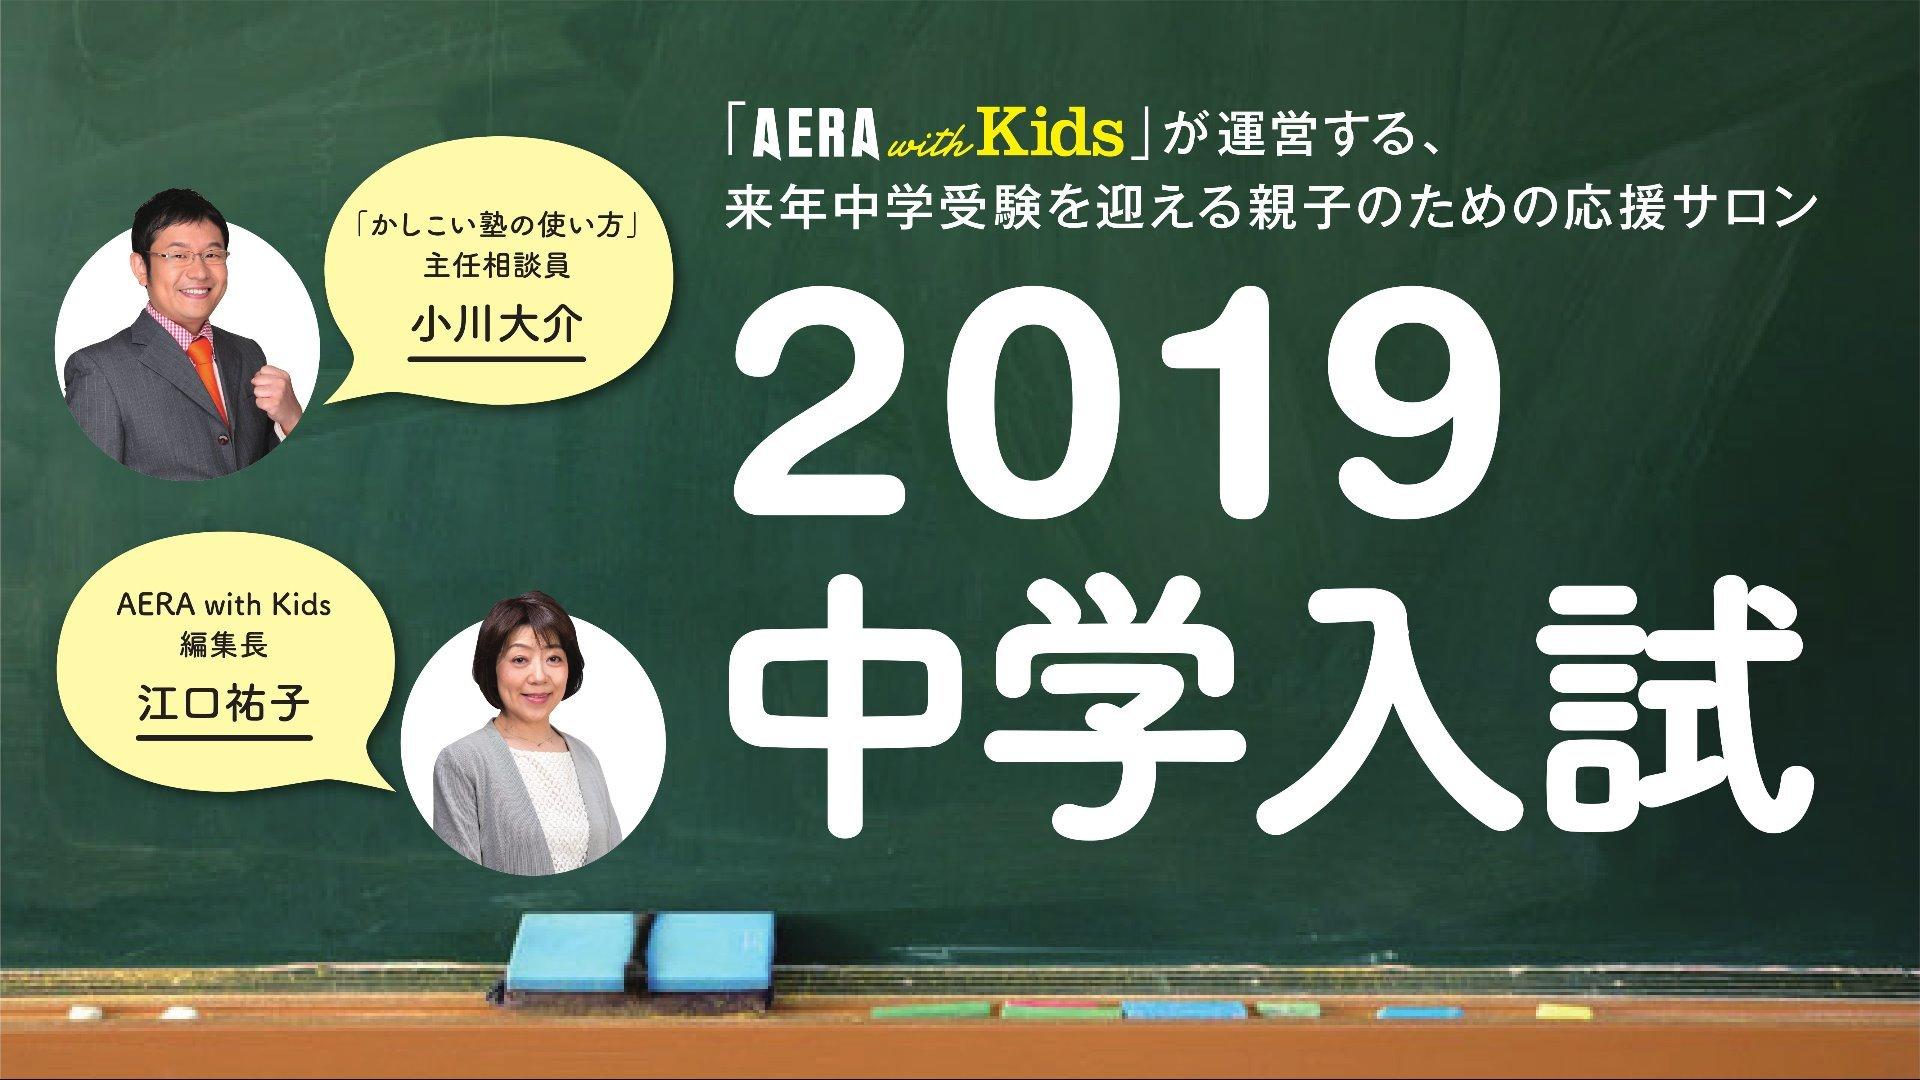 AERA with Kids サロン「2019年中学入試」